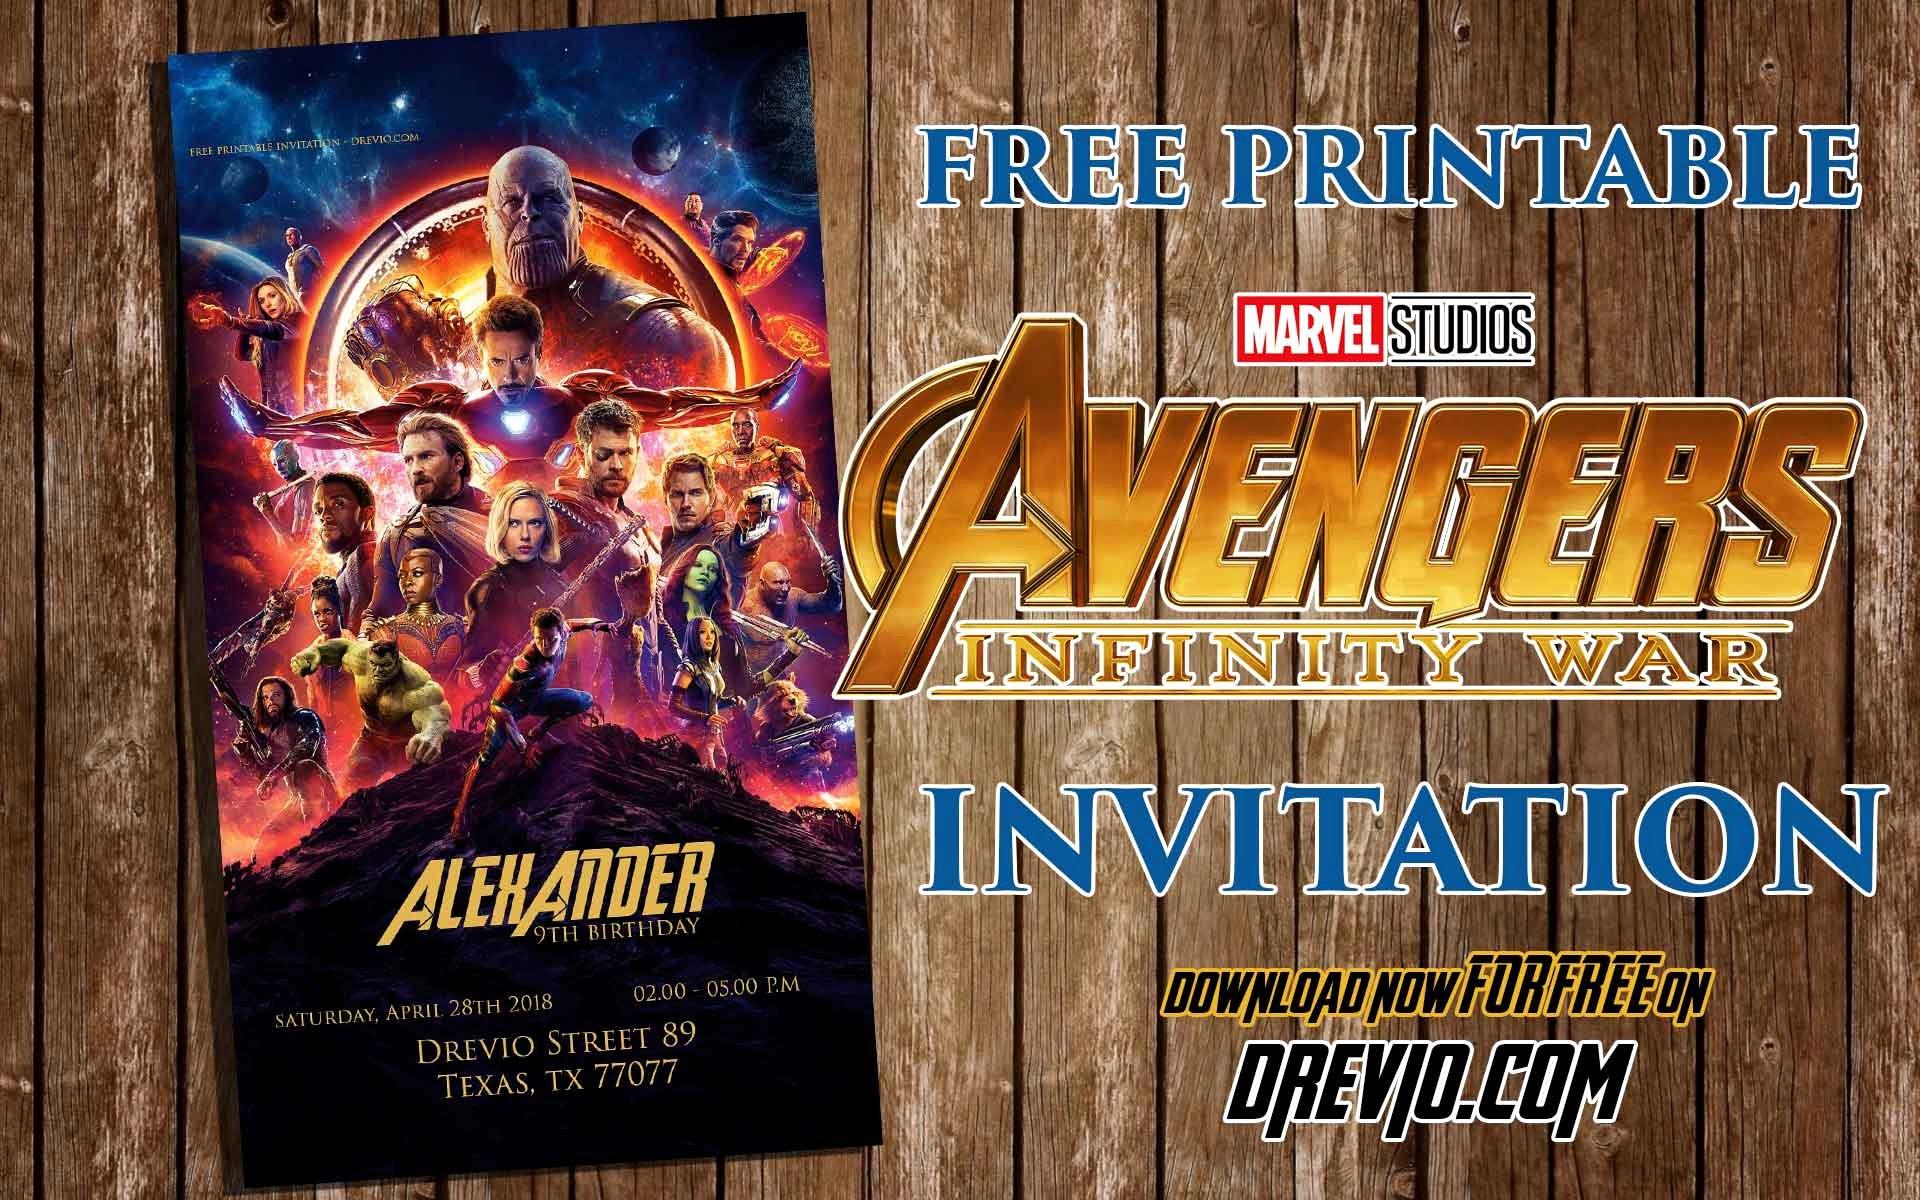 Avenger Birthday Party Invitations Fresh Free Printable Avengers Infinity Wars Birthday Invitation